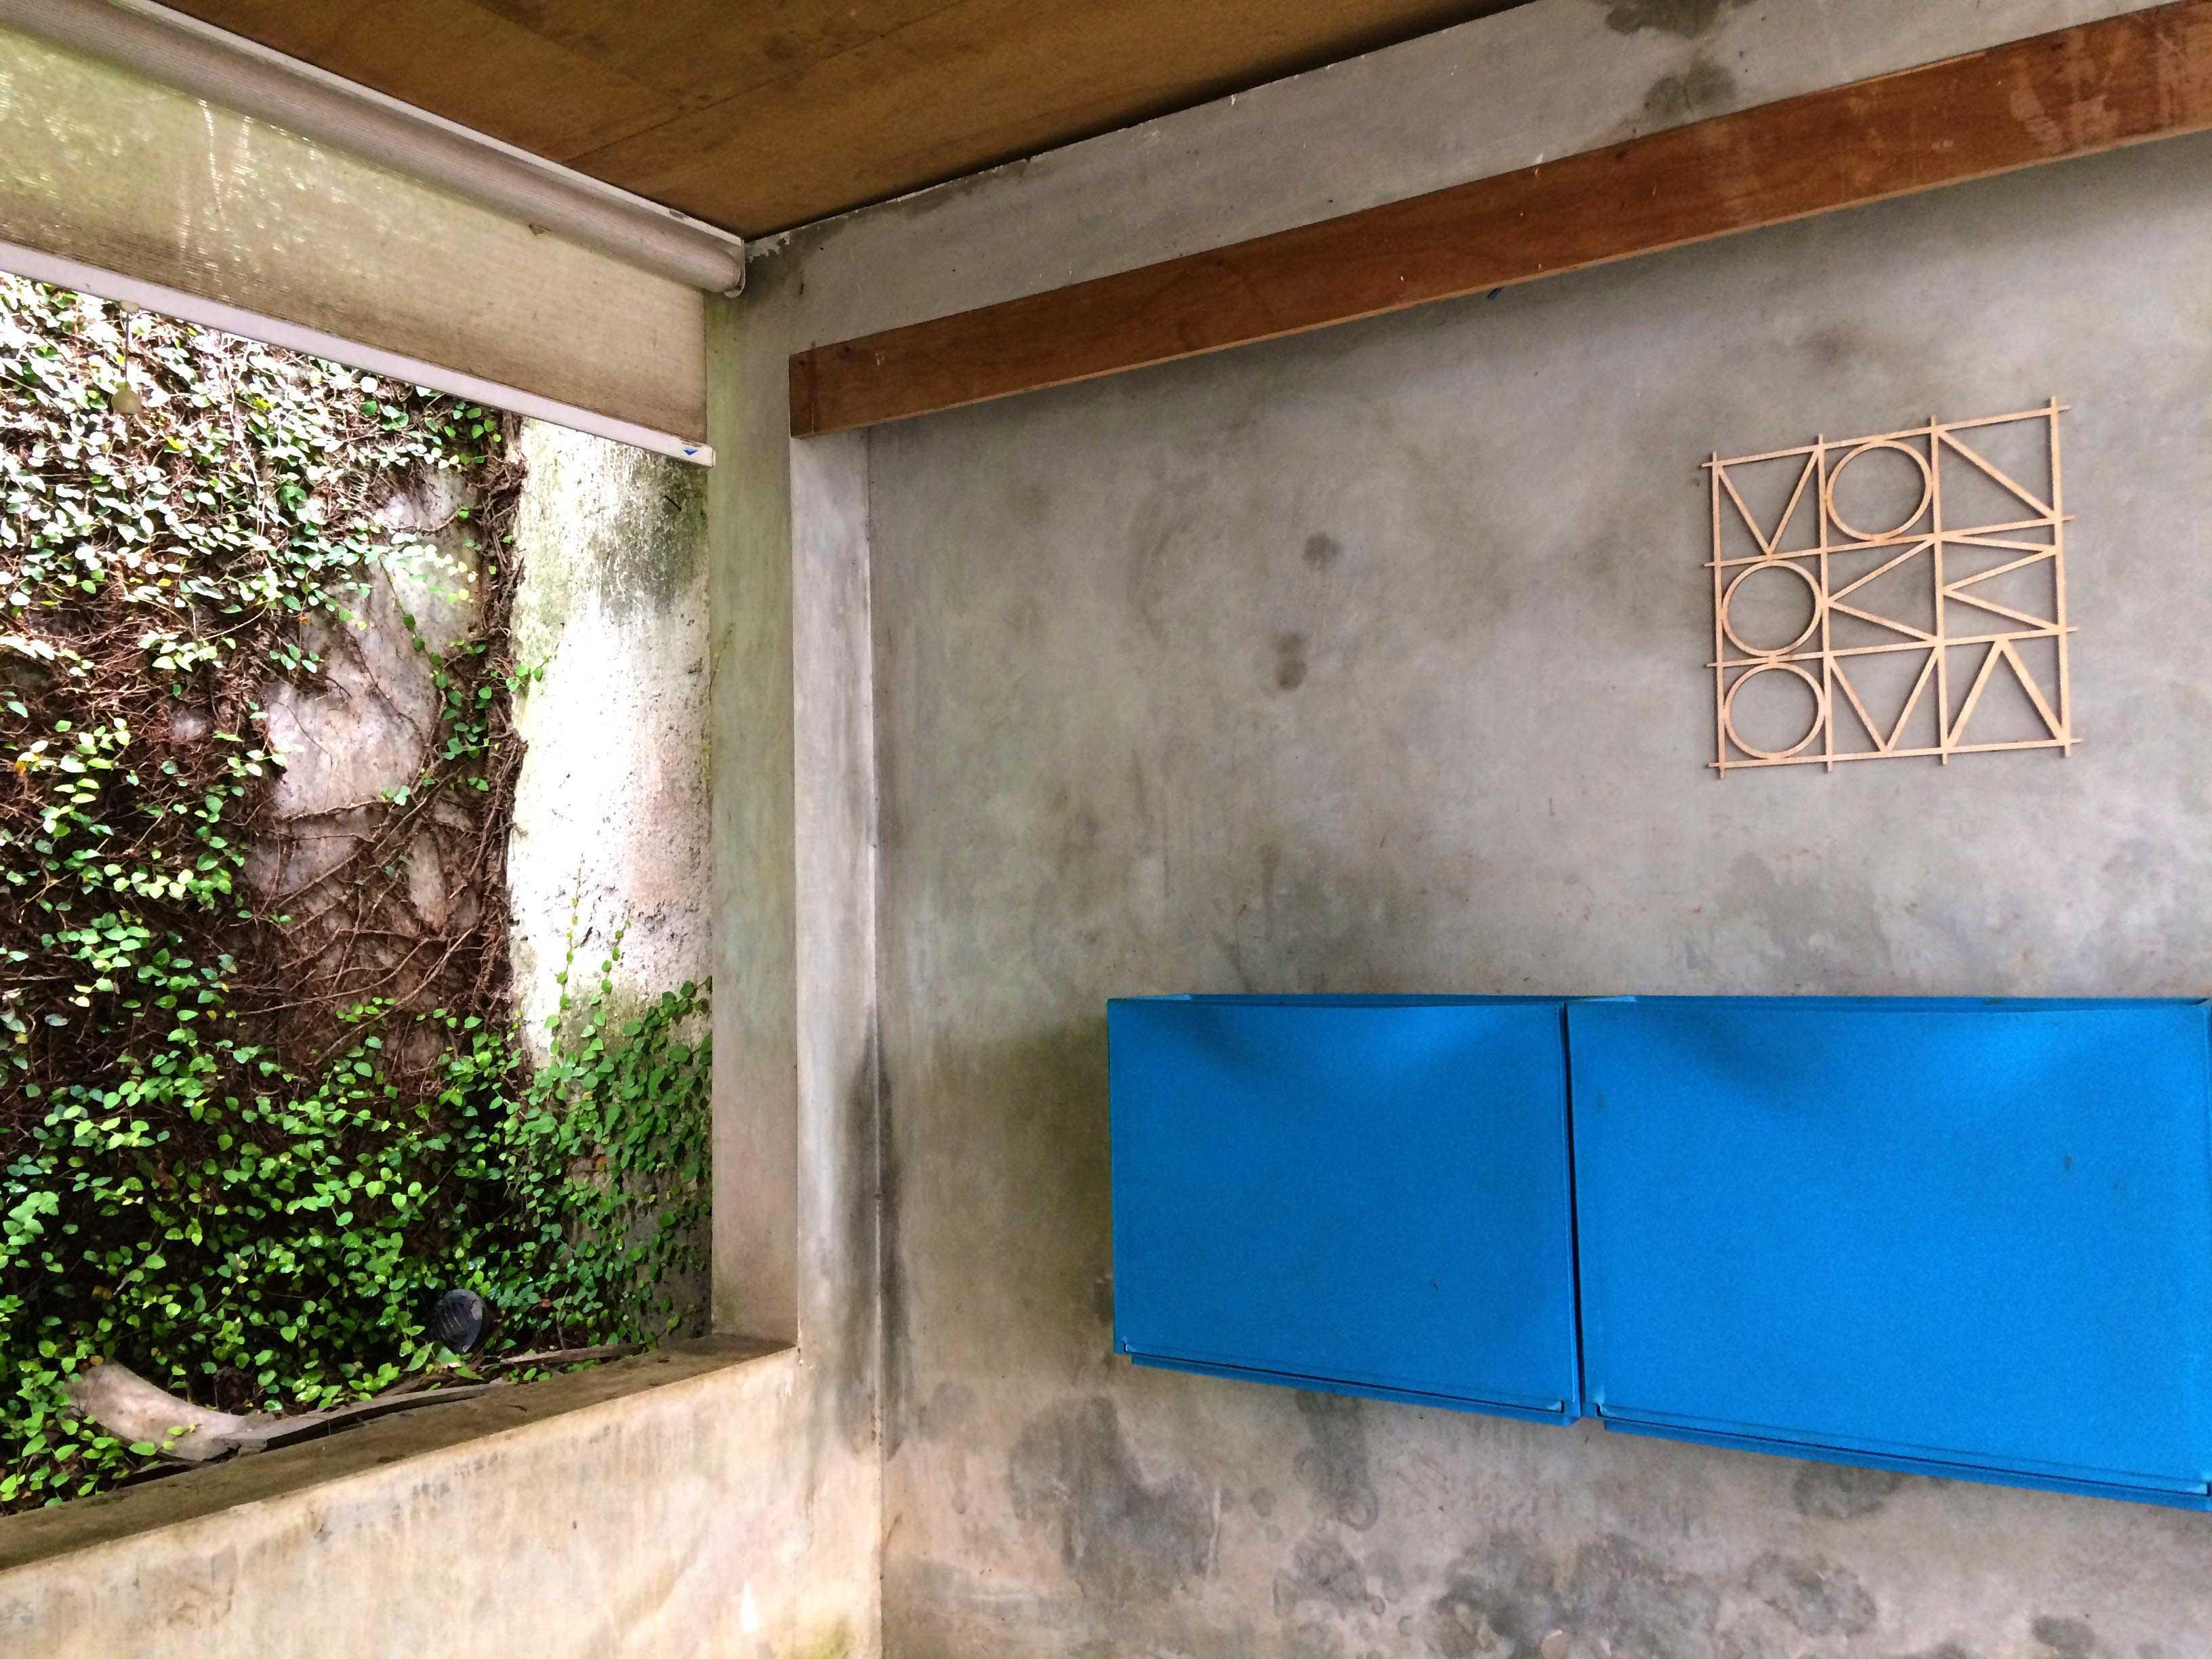 Monokroma Architect Monokroma Architect Office Lippo Karawaci Lippo Karawaci 5-Porch Modern  23586